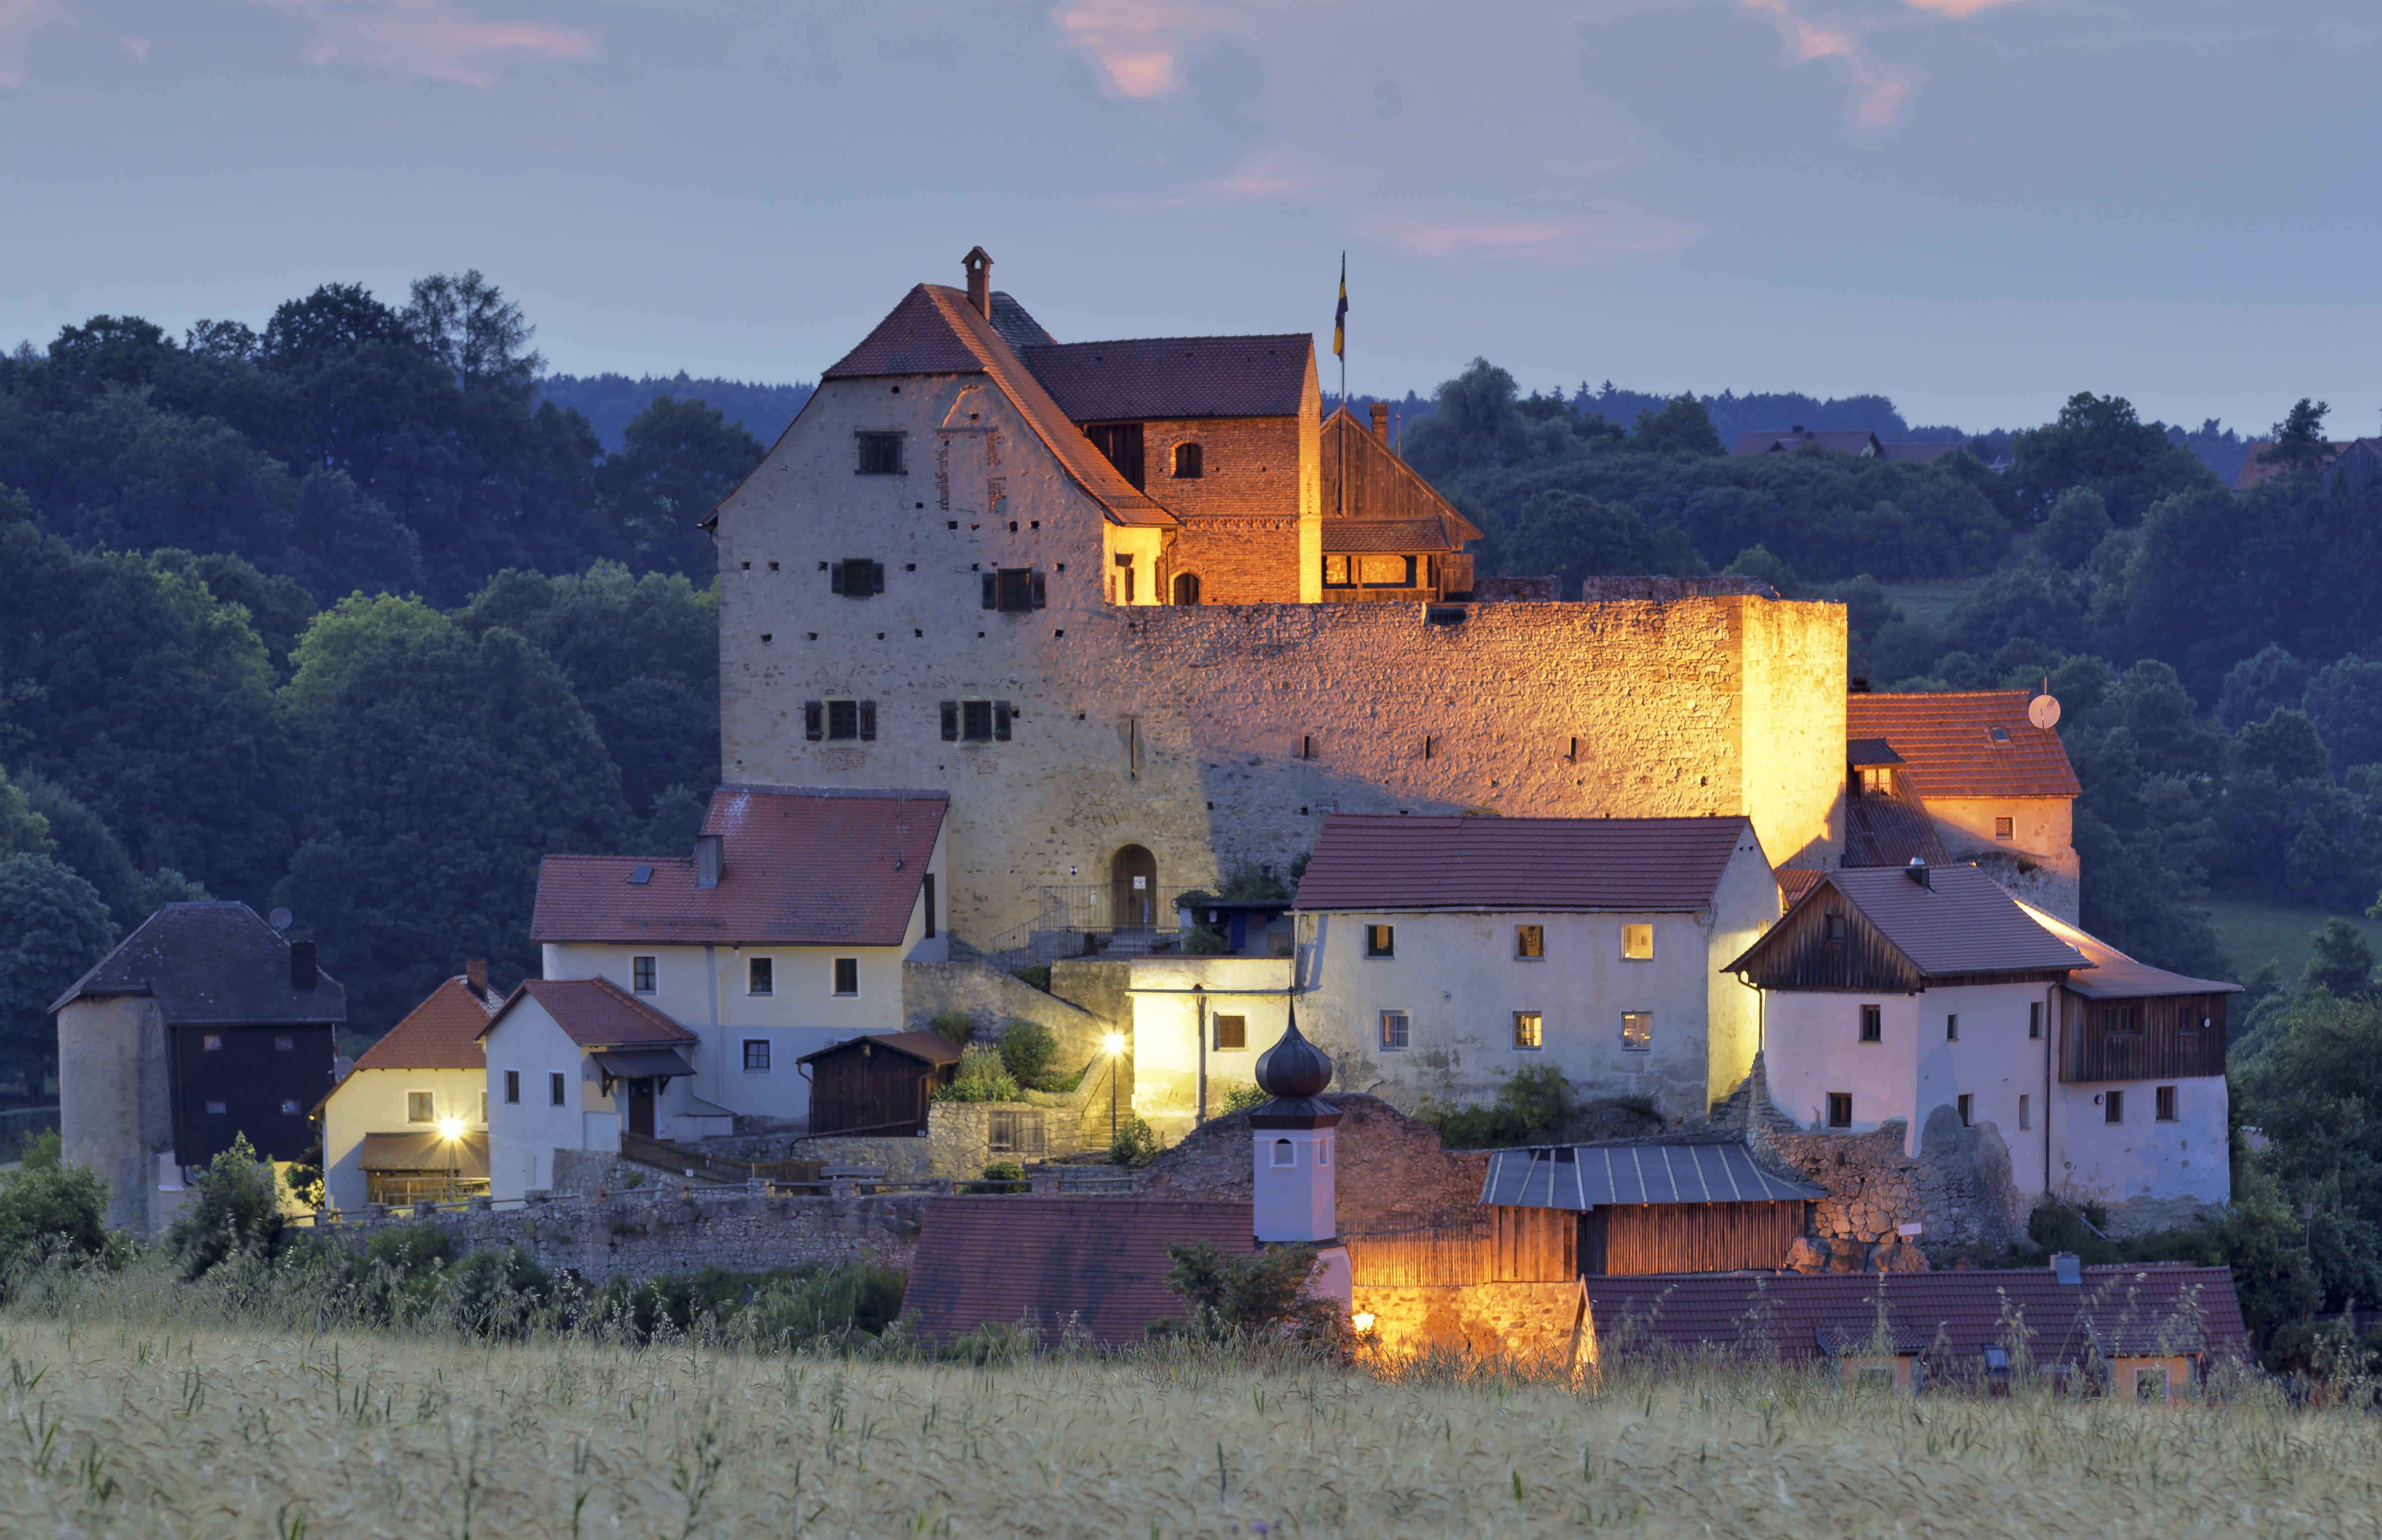 Wandern In Regensburg